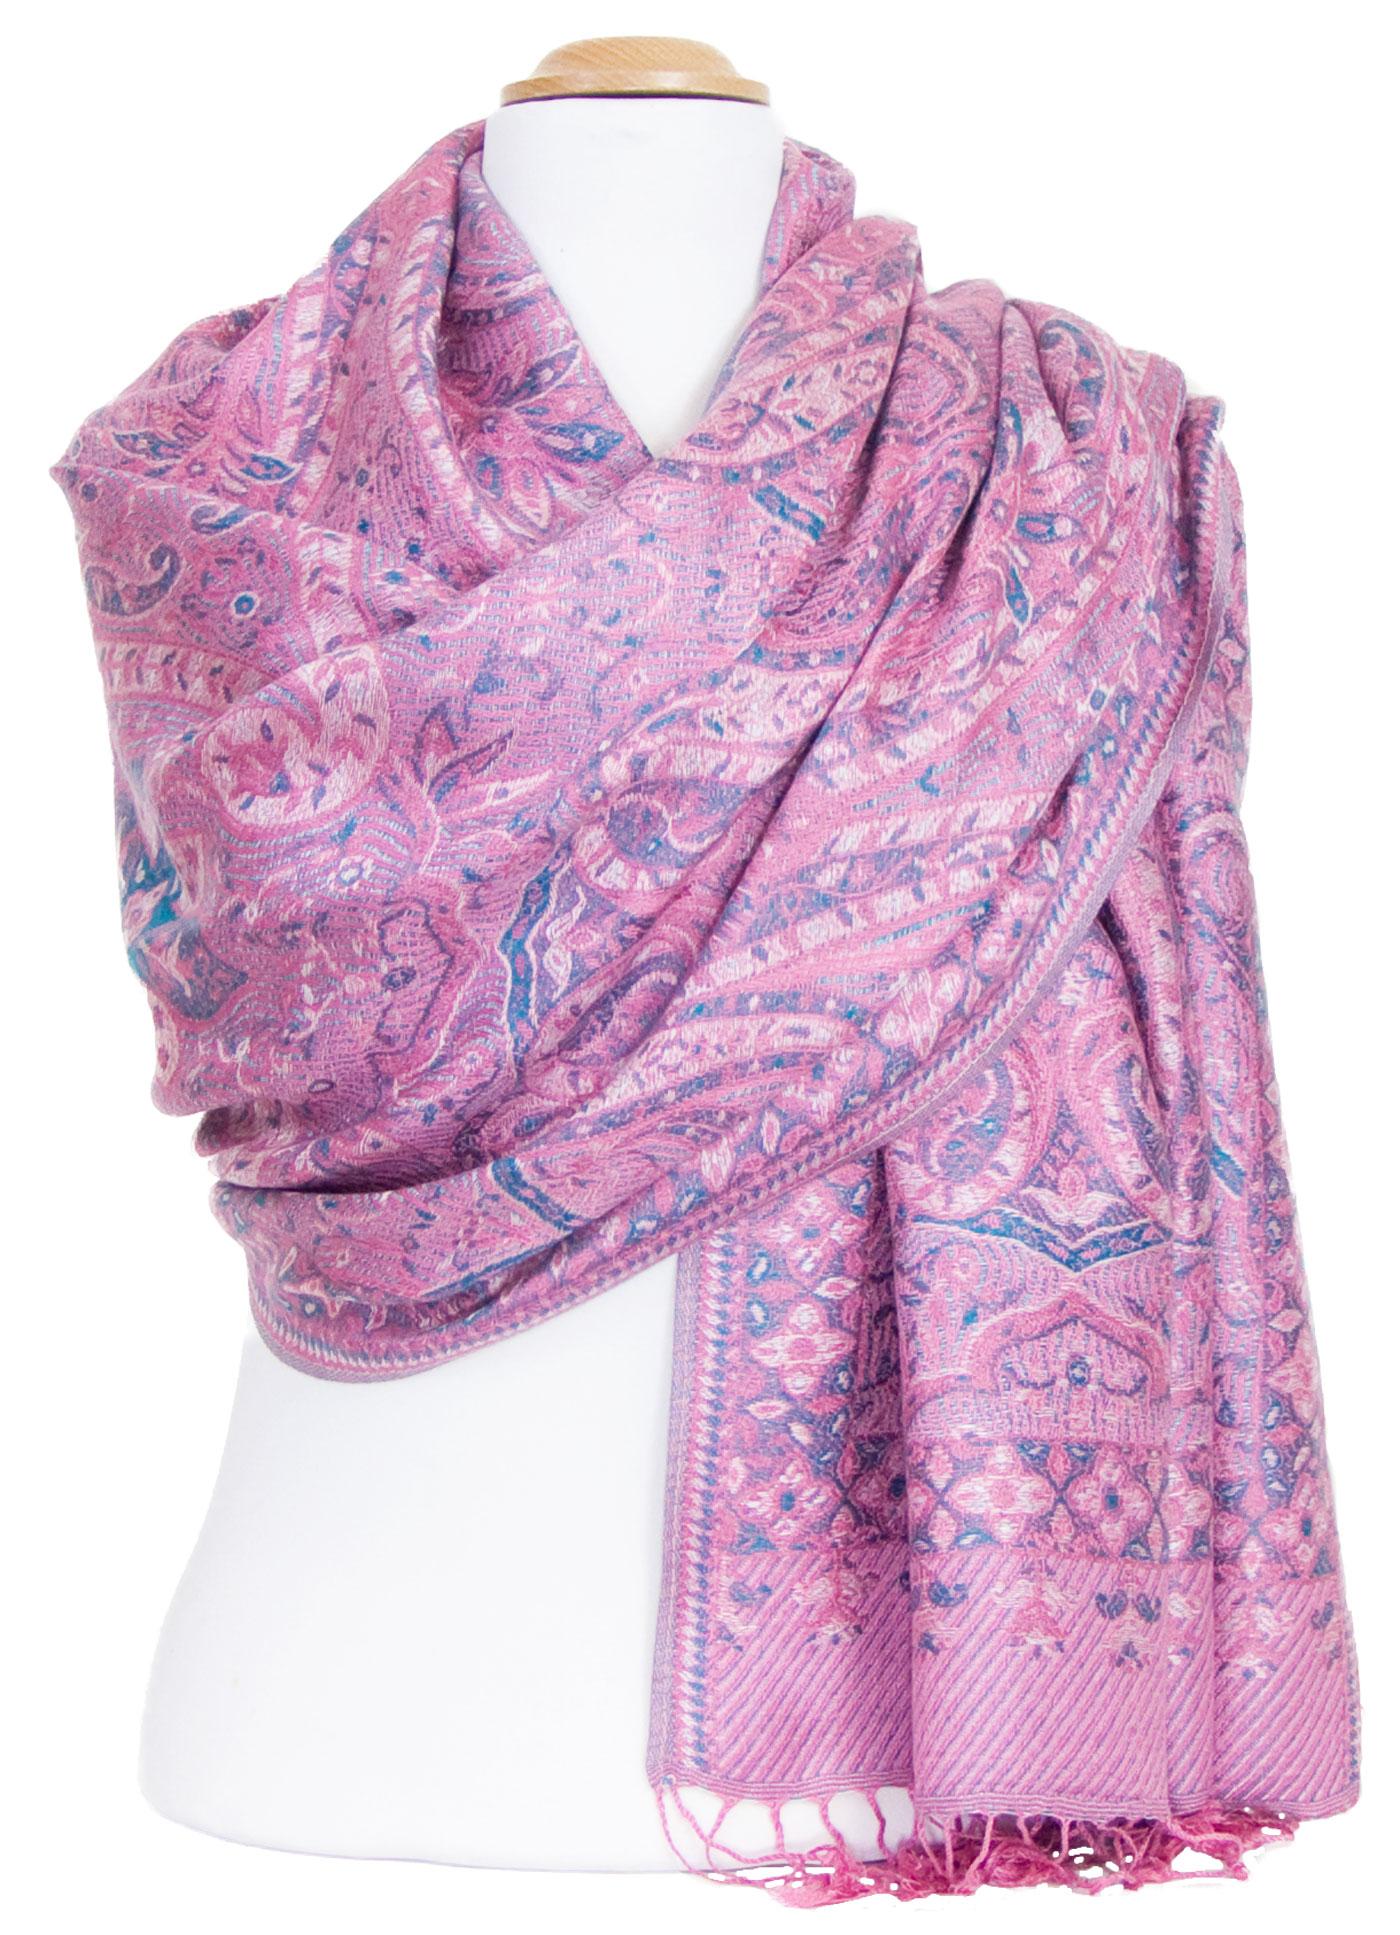 Etole pashmina rose motifs baroques